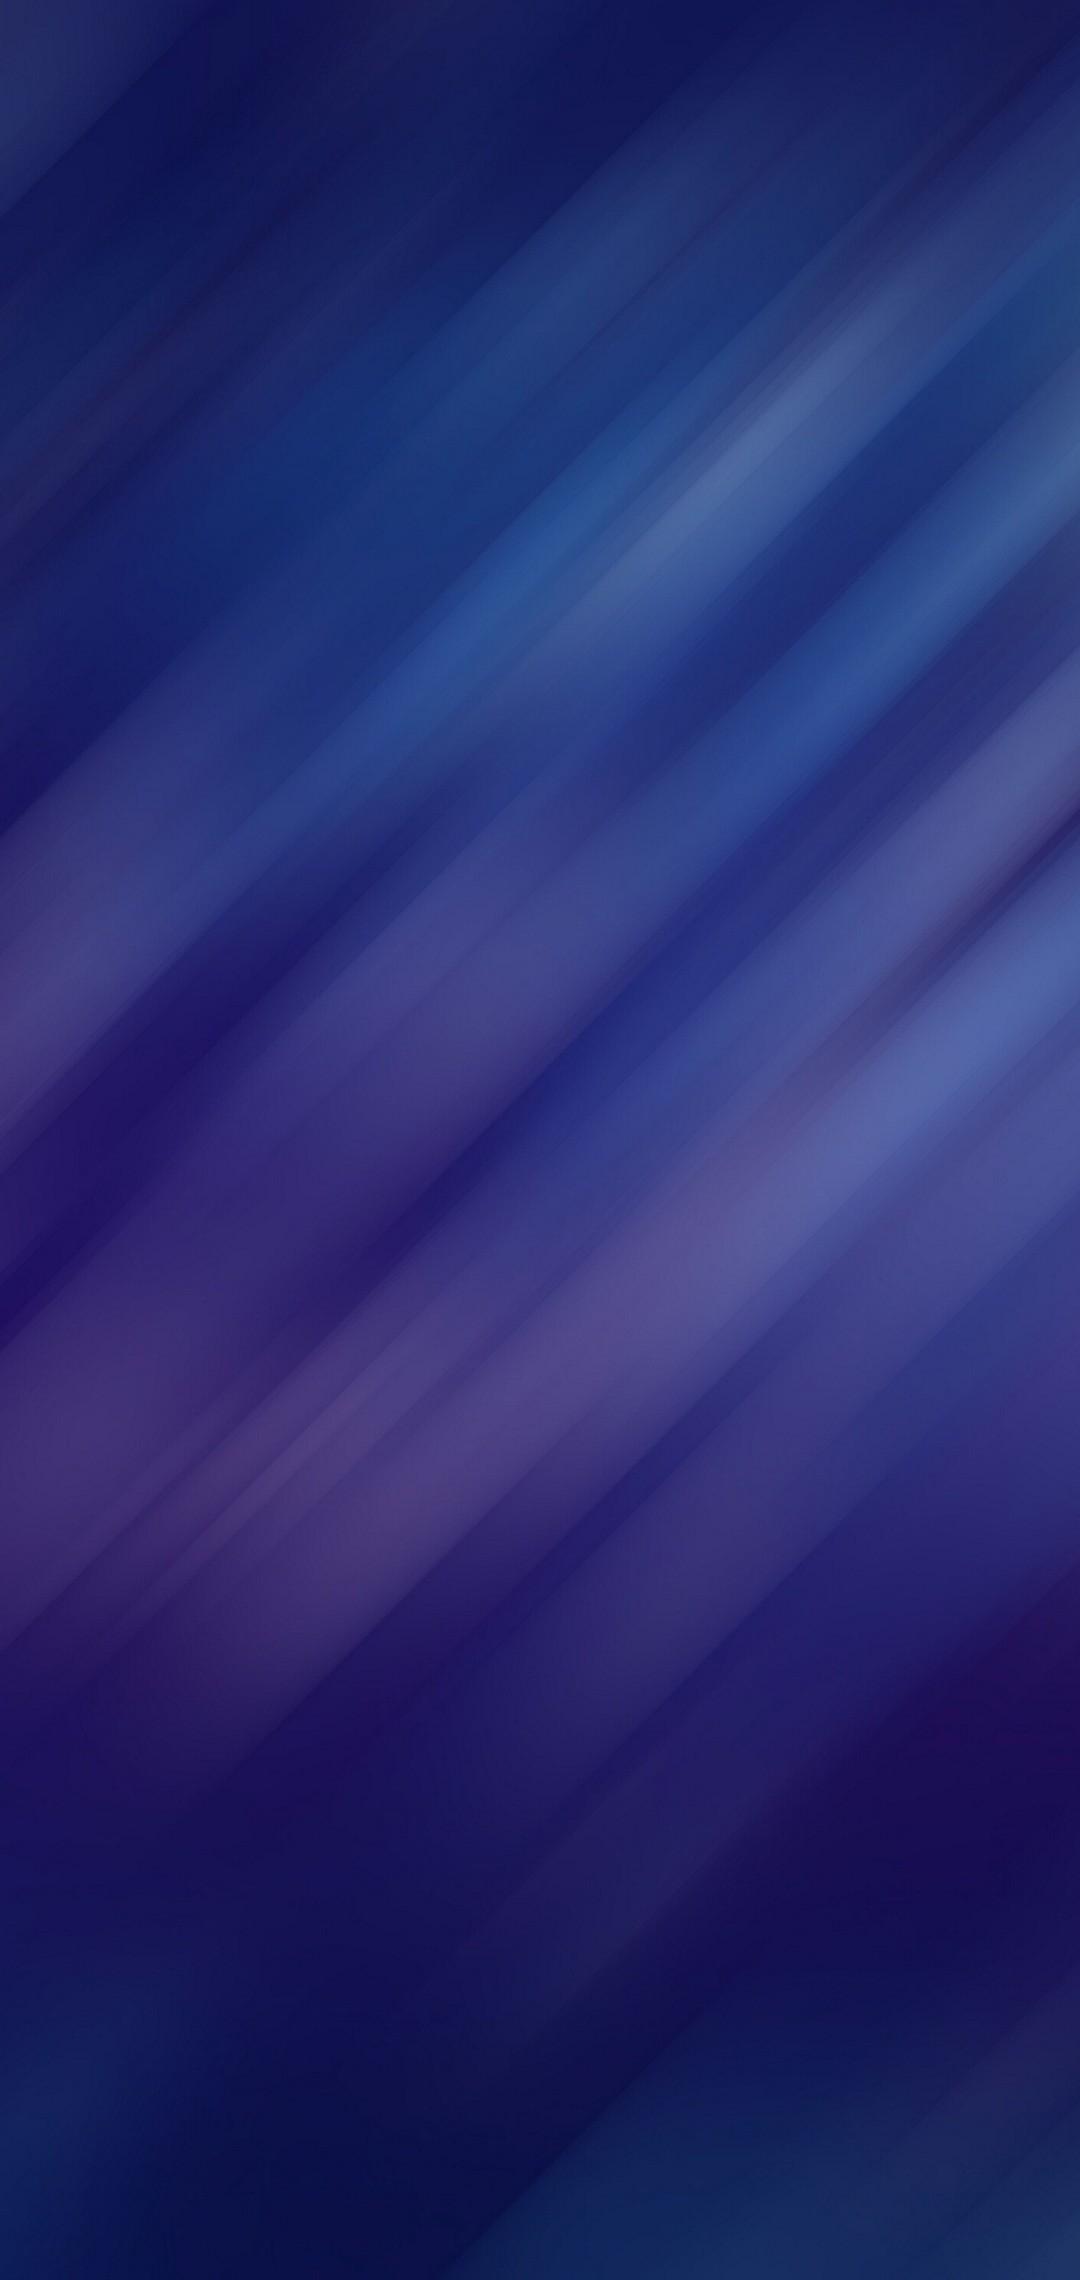 1080x2280 wallpaper